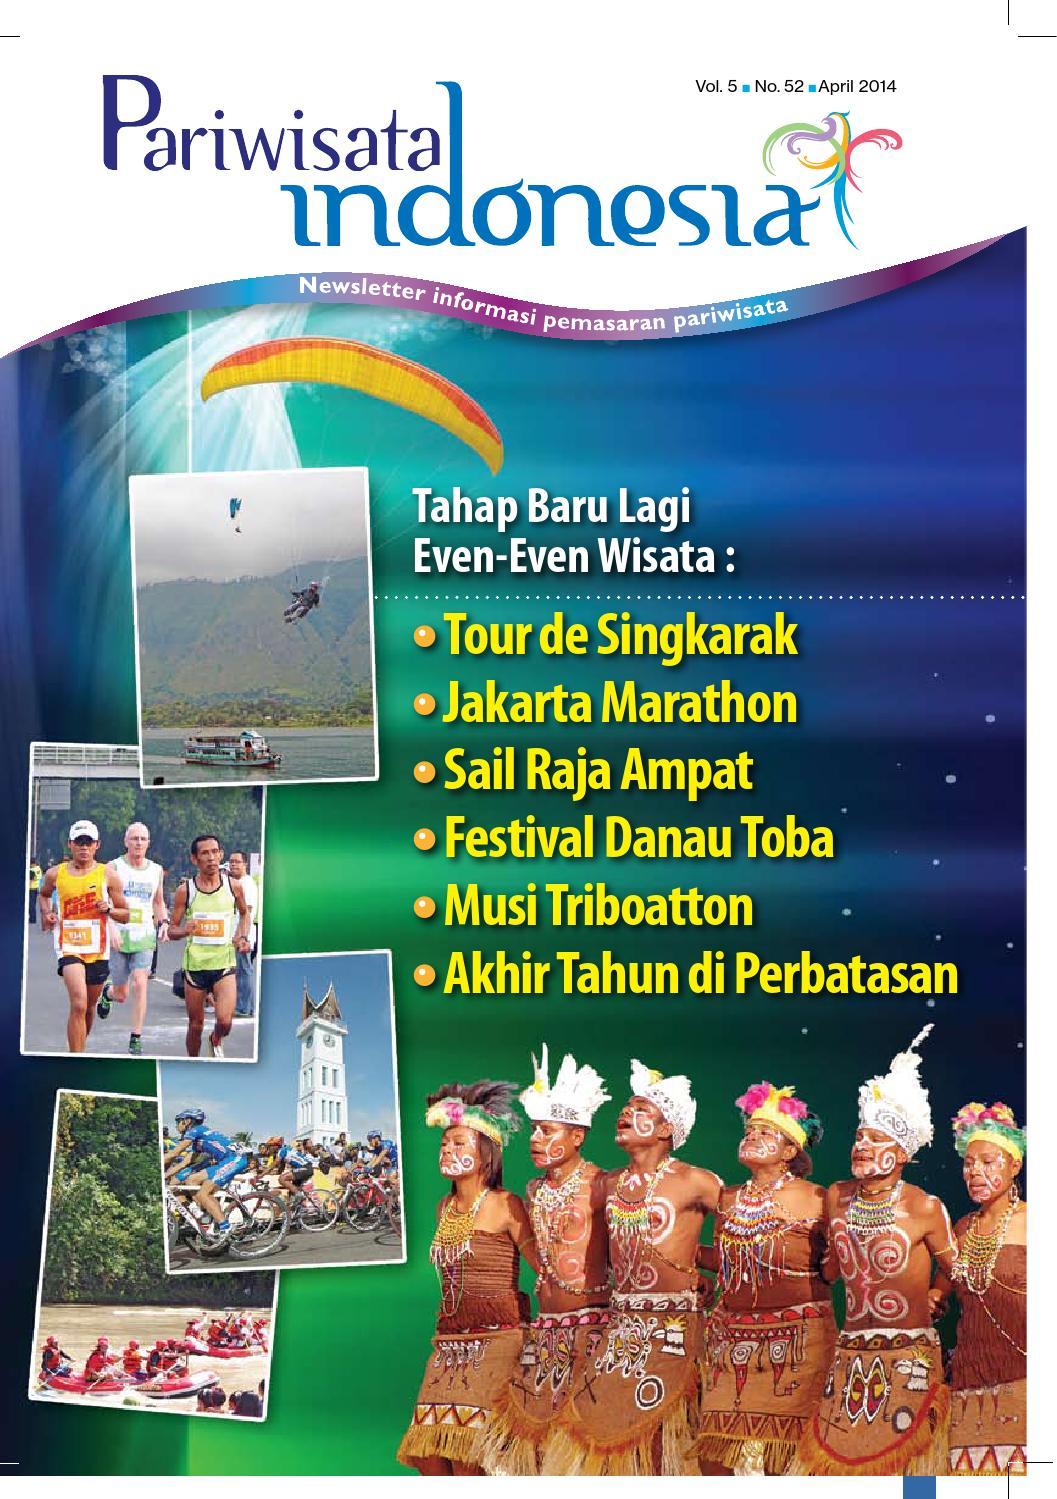 Newsletter Pariwisata Indonesia Edisi 9 - April 9 by Muhammad